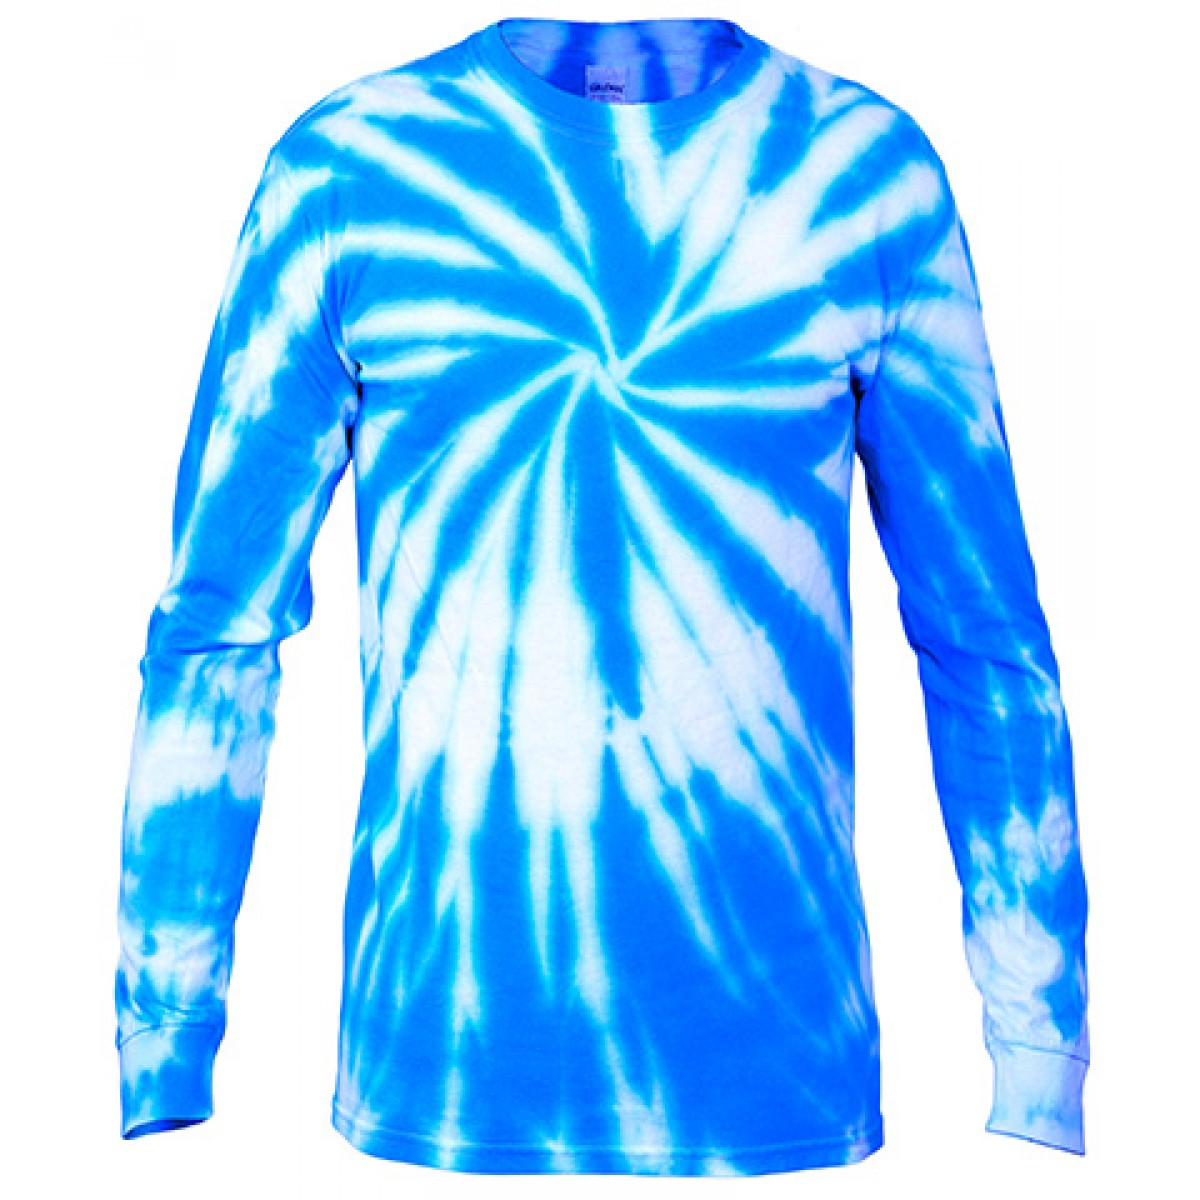 Multi Color Tie-Dye Long Sleeve Shirt -Blue-S